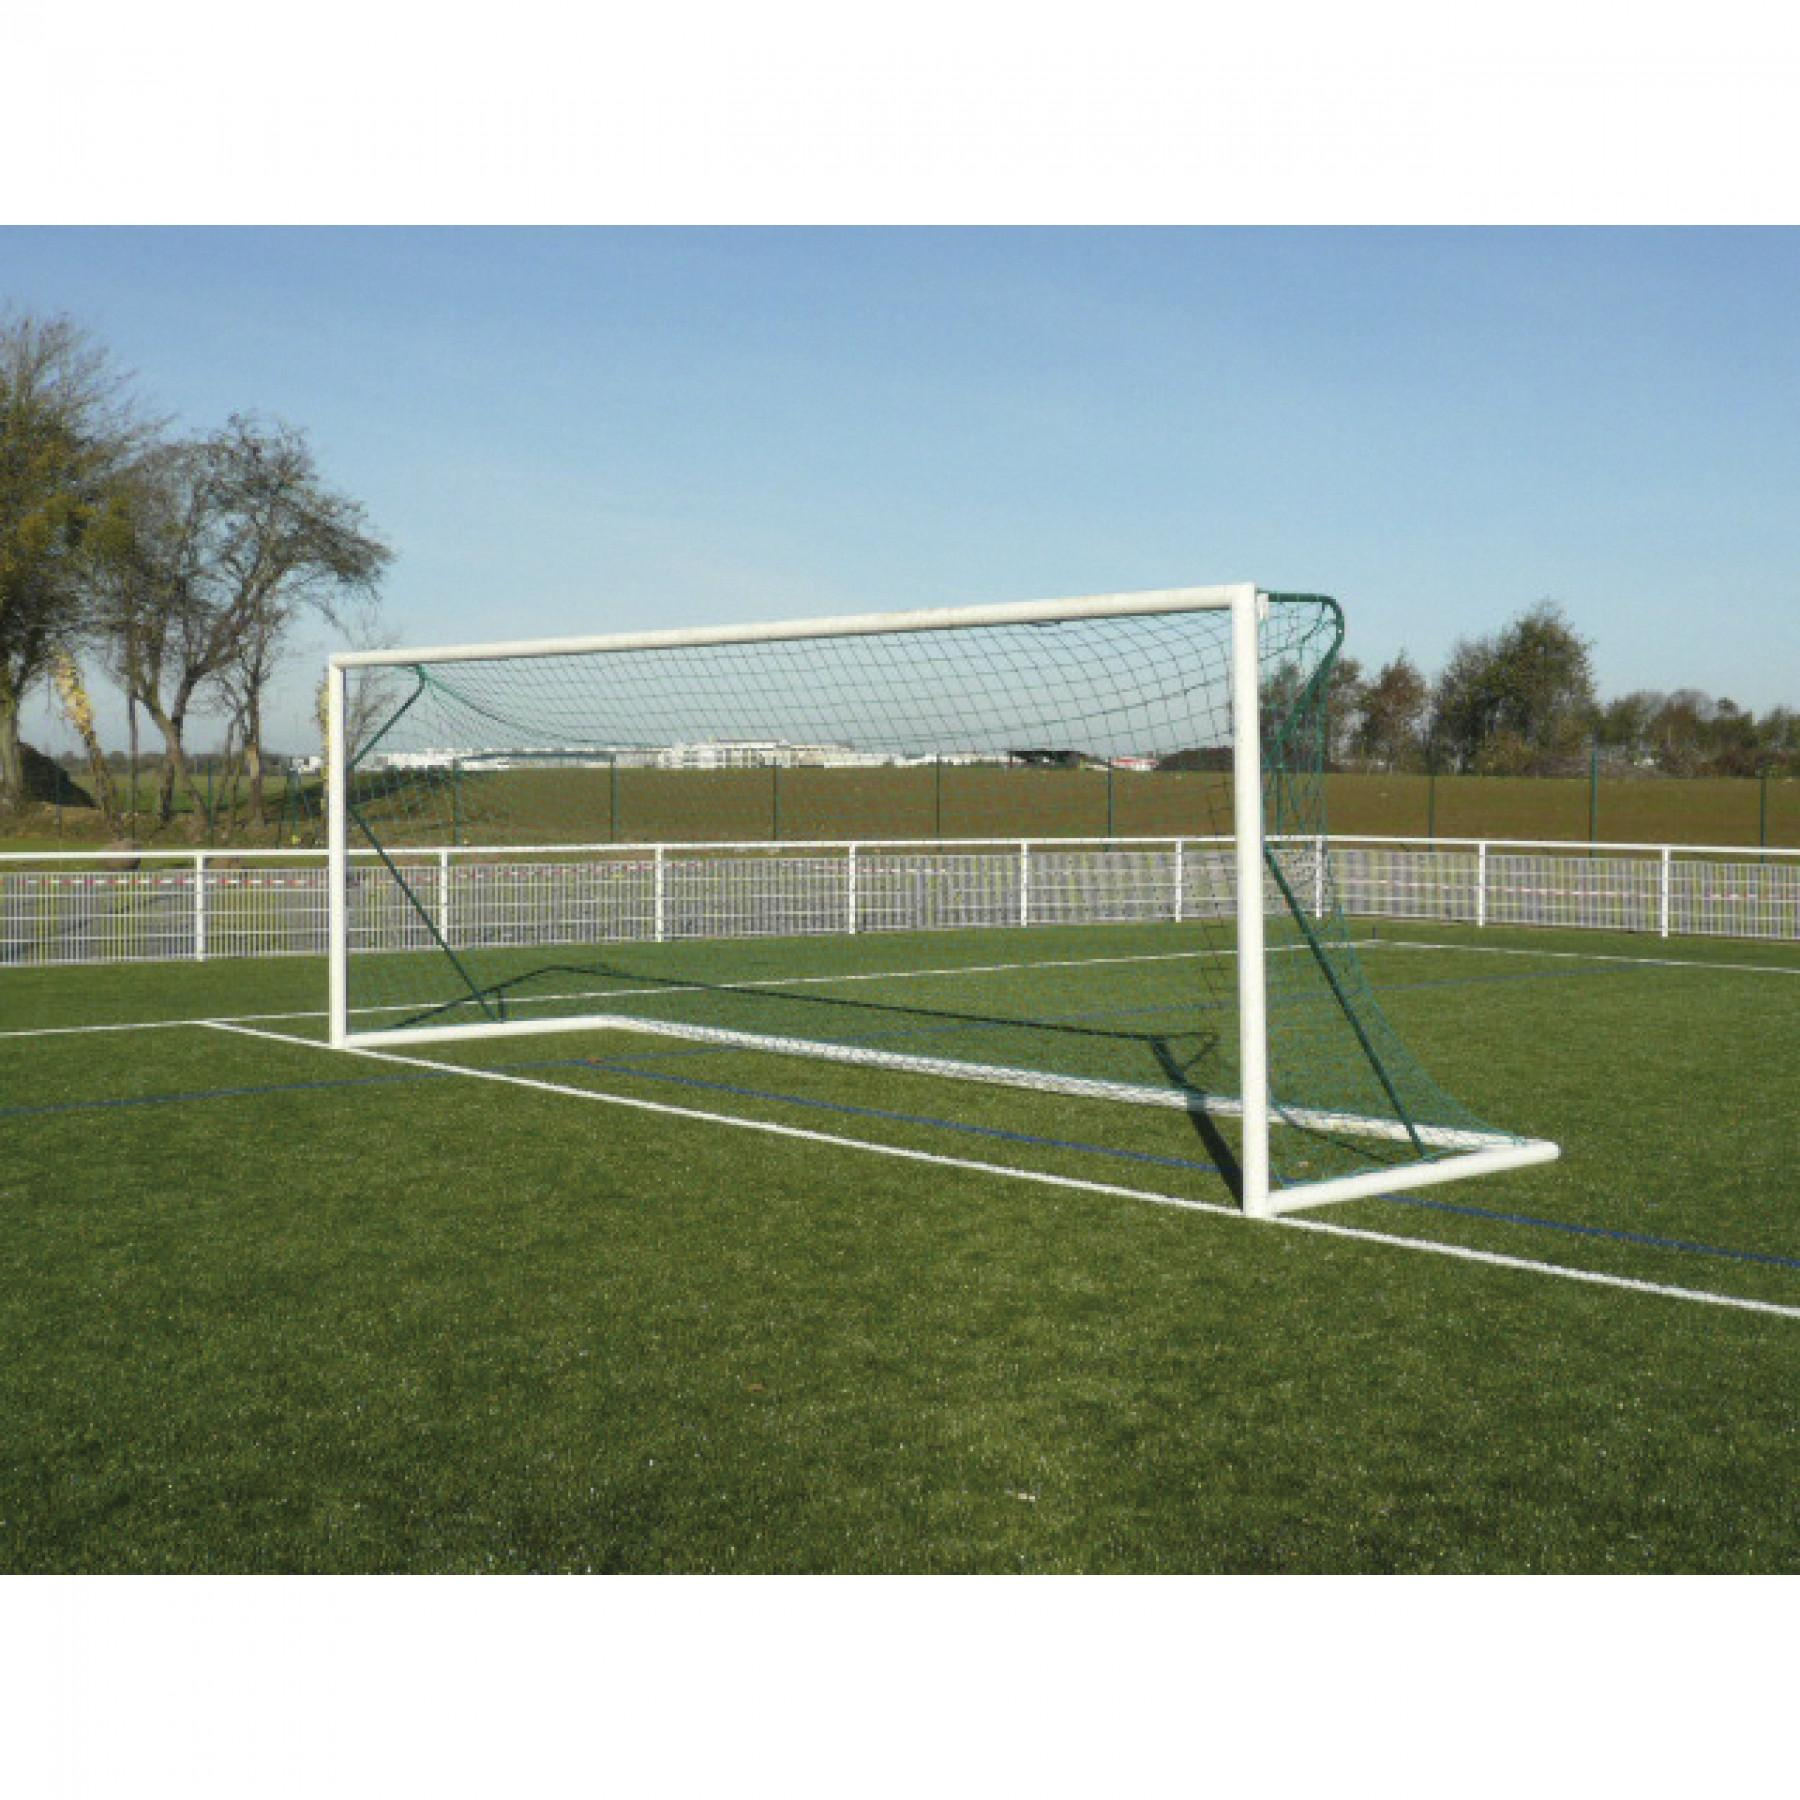 Football goal Metalu Plast Maracana